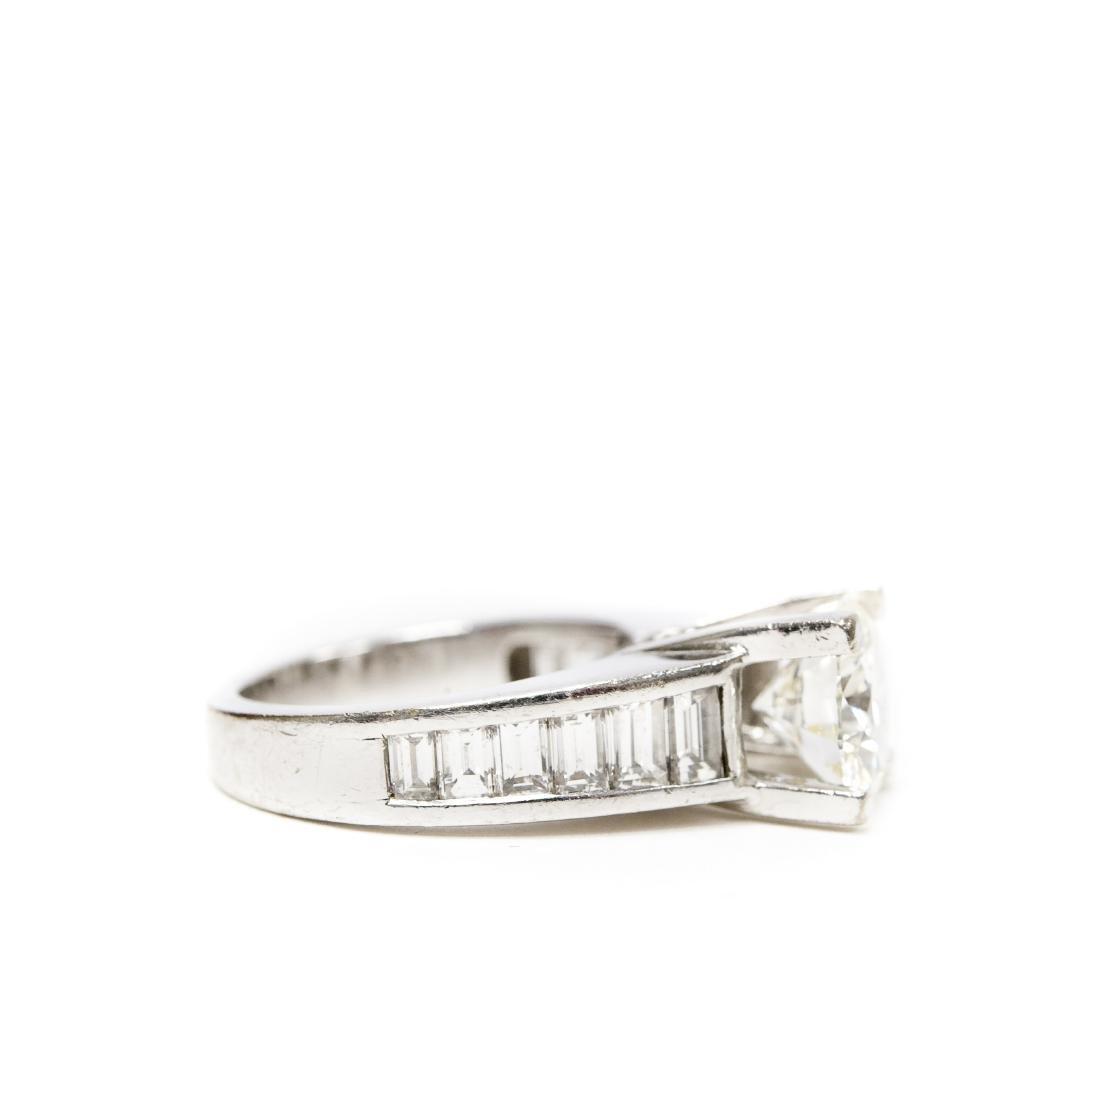 18K White Gold & Diamond Ring. 2.17 ct Center Diamond. - 4